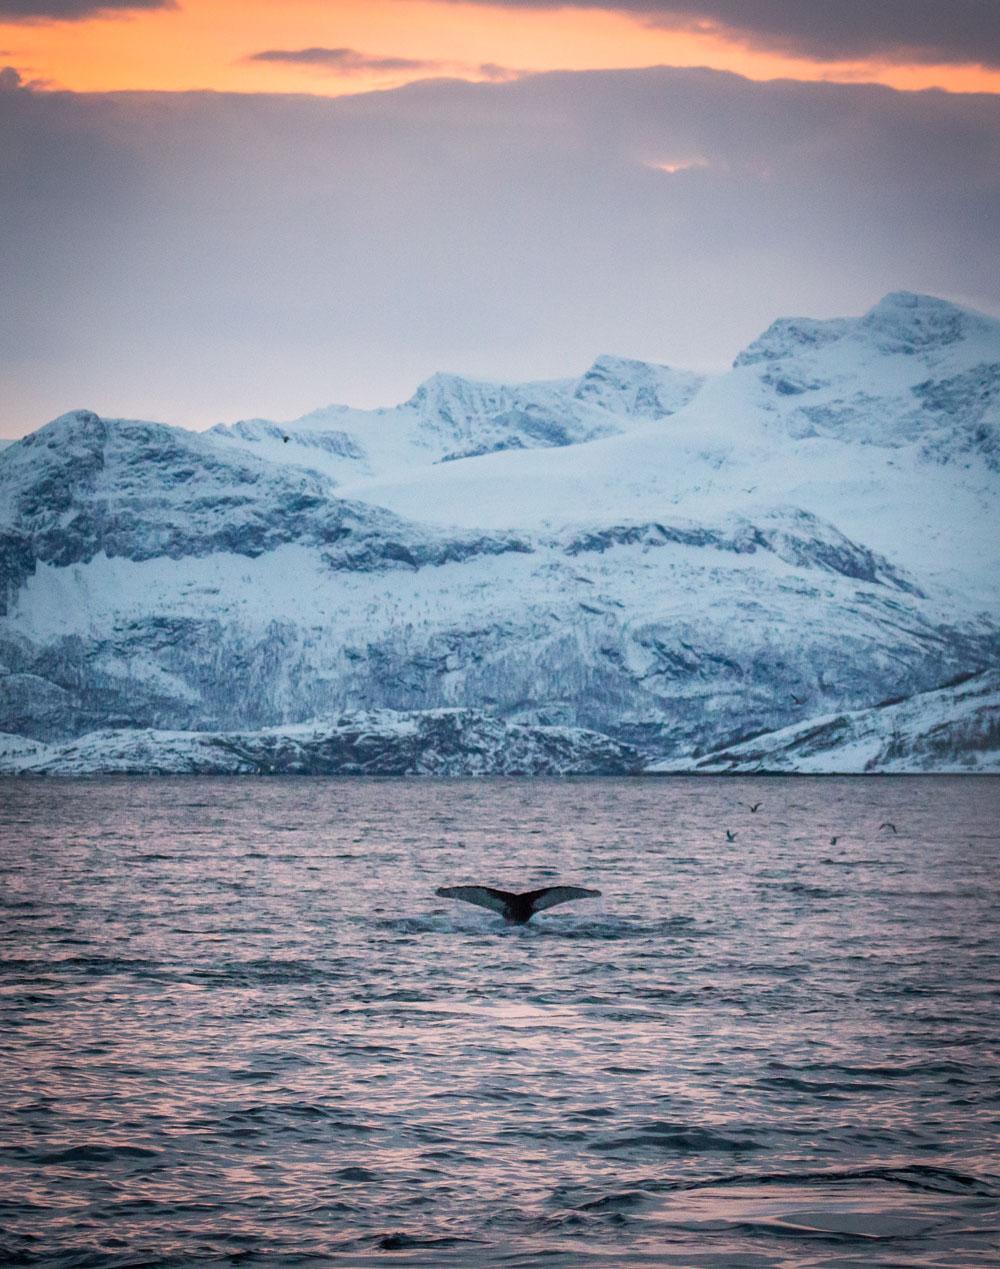 Humpback whale in Skjervøy